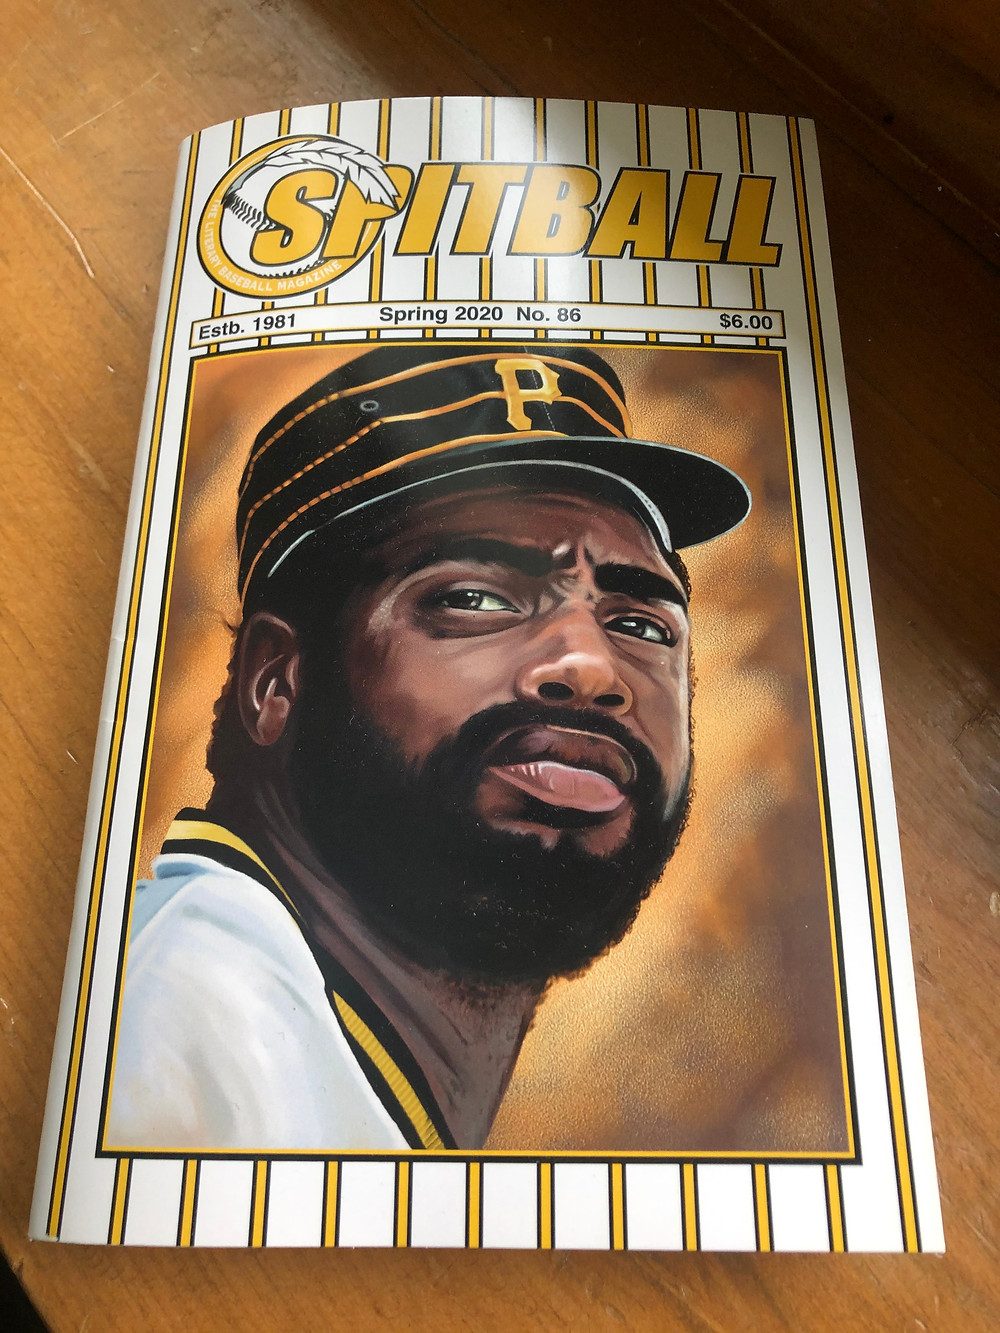 Spring 2020 cover of Spitball: The Literary Baseball Magazine